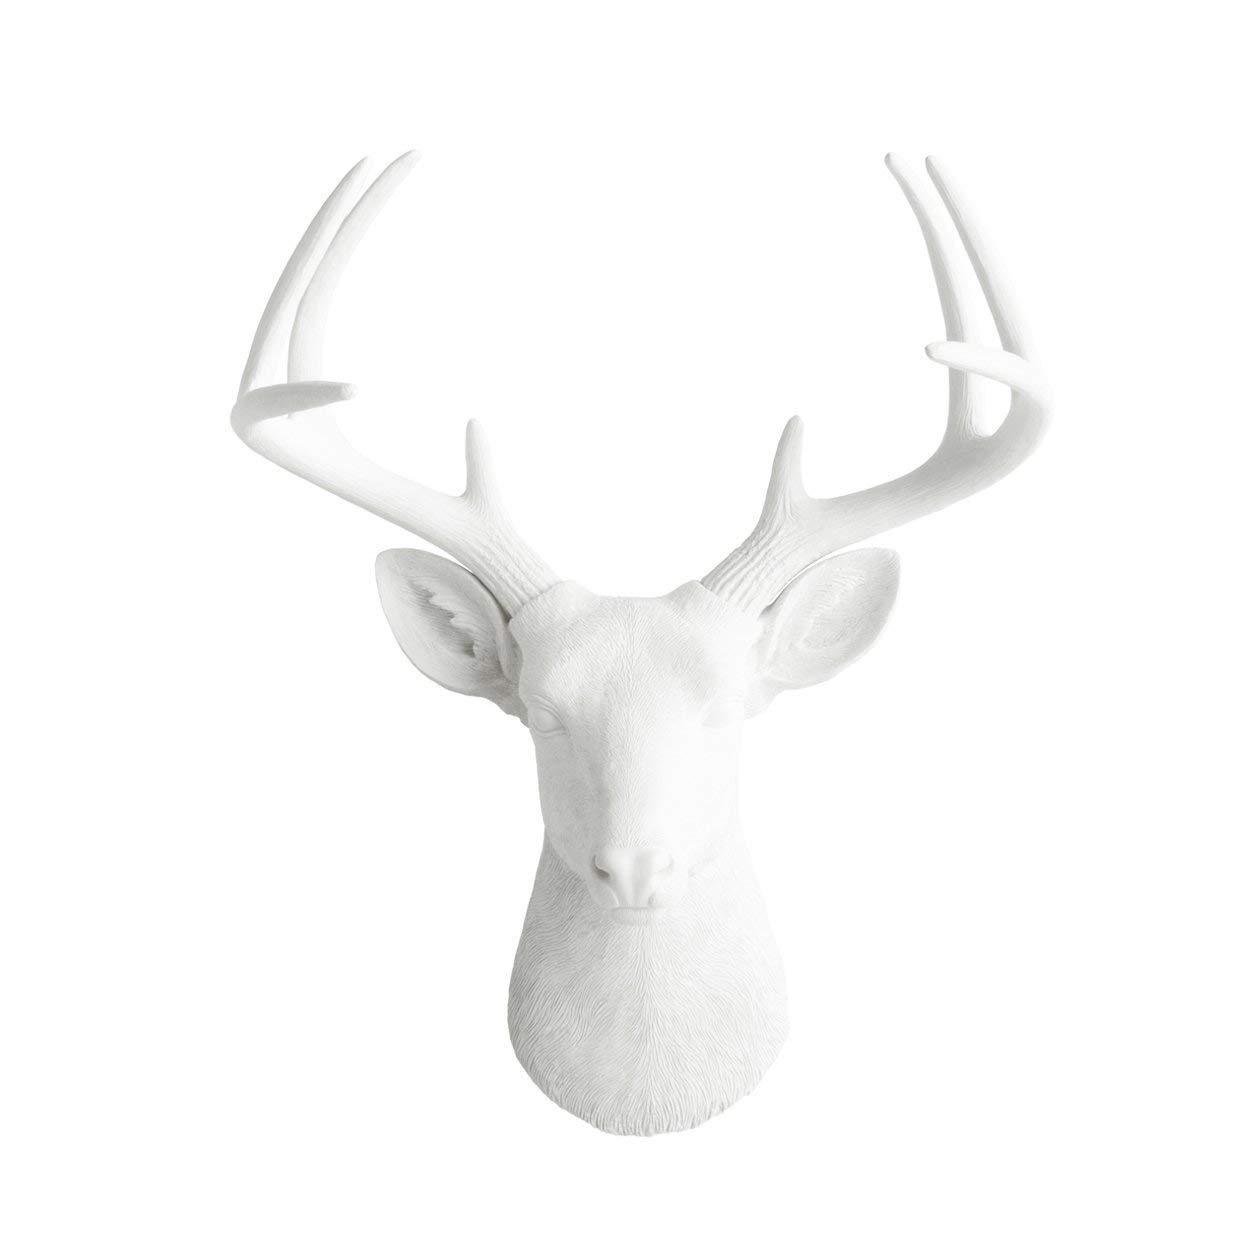 "WALL CHARMERS Large White Faux Deer Head - 21"" Faux Taxidermy Animal Head Wall Decor - Handmade Farmhouse Decor"